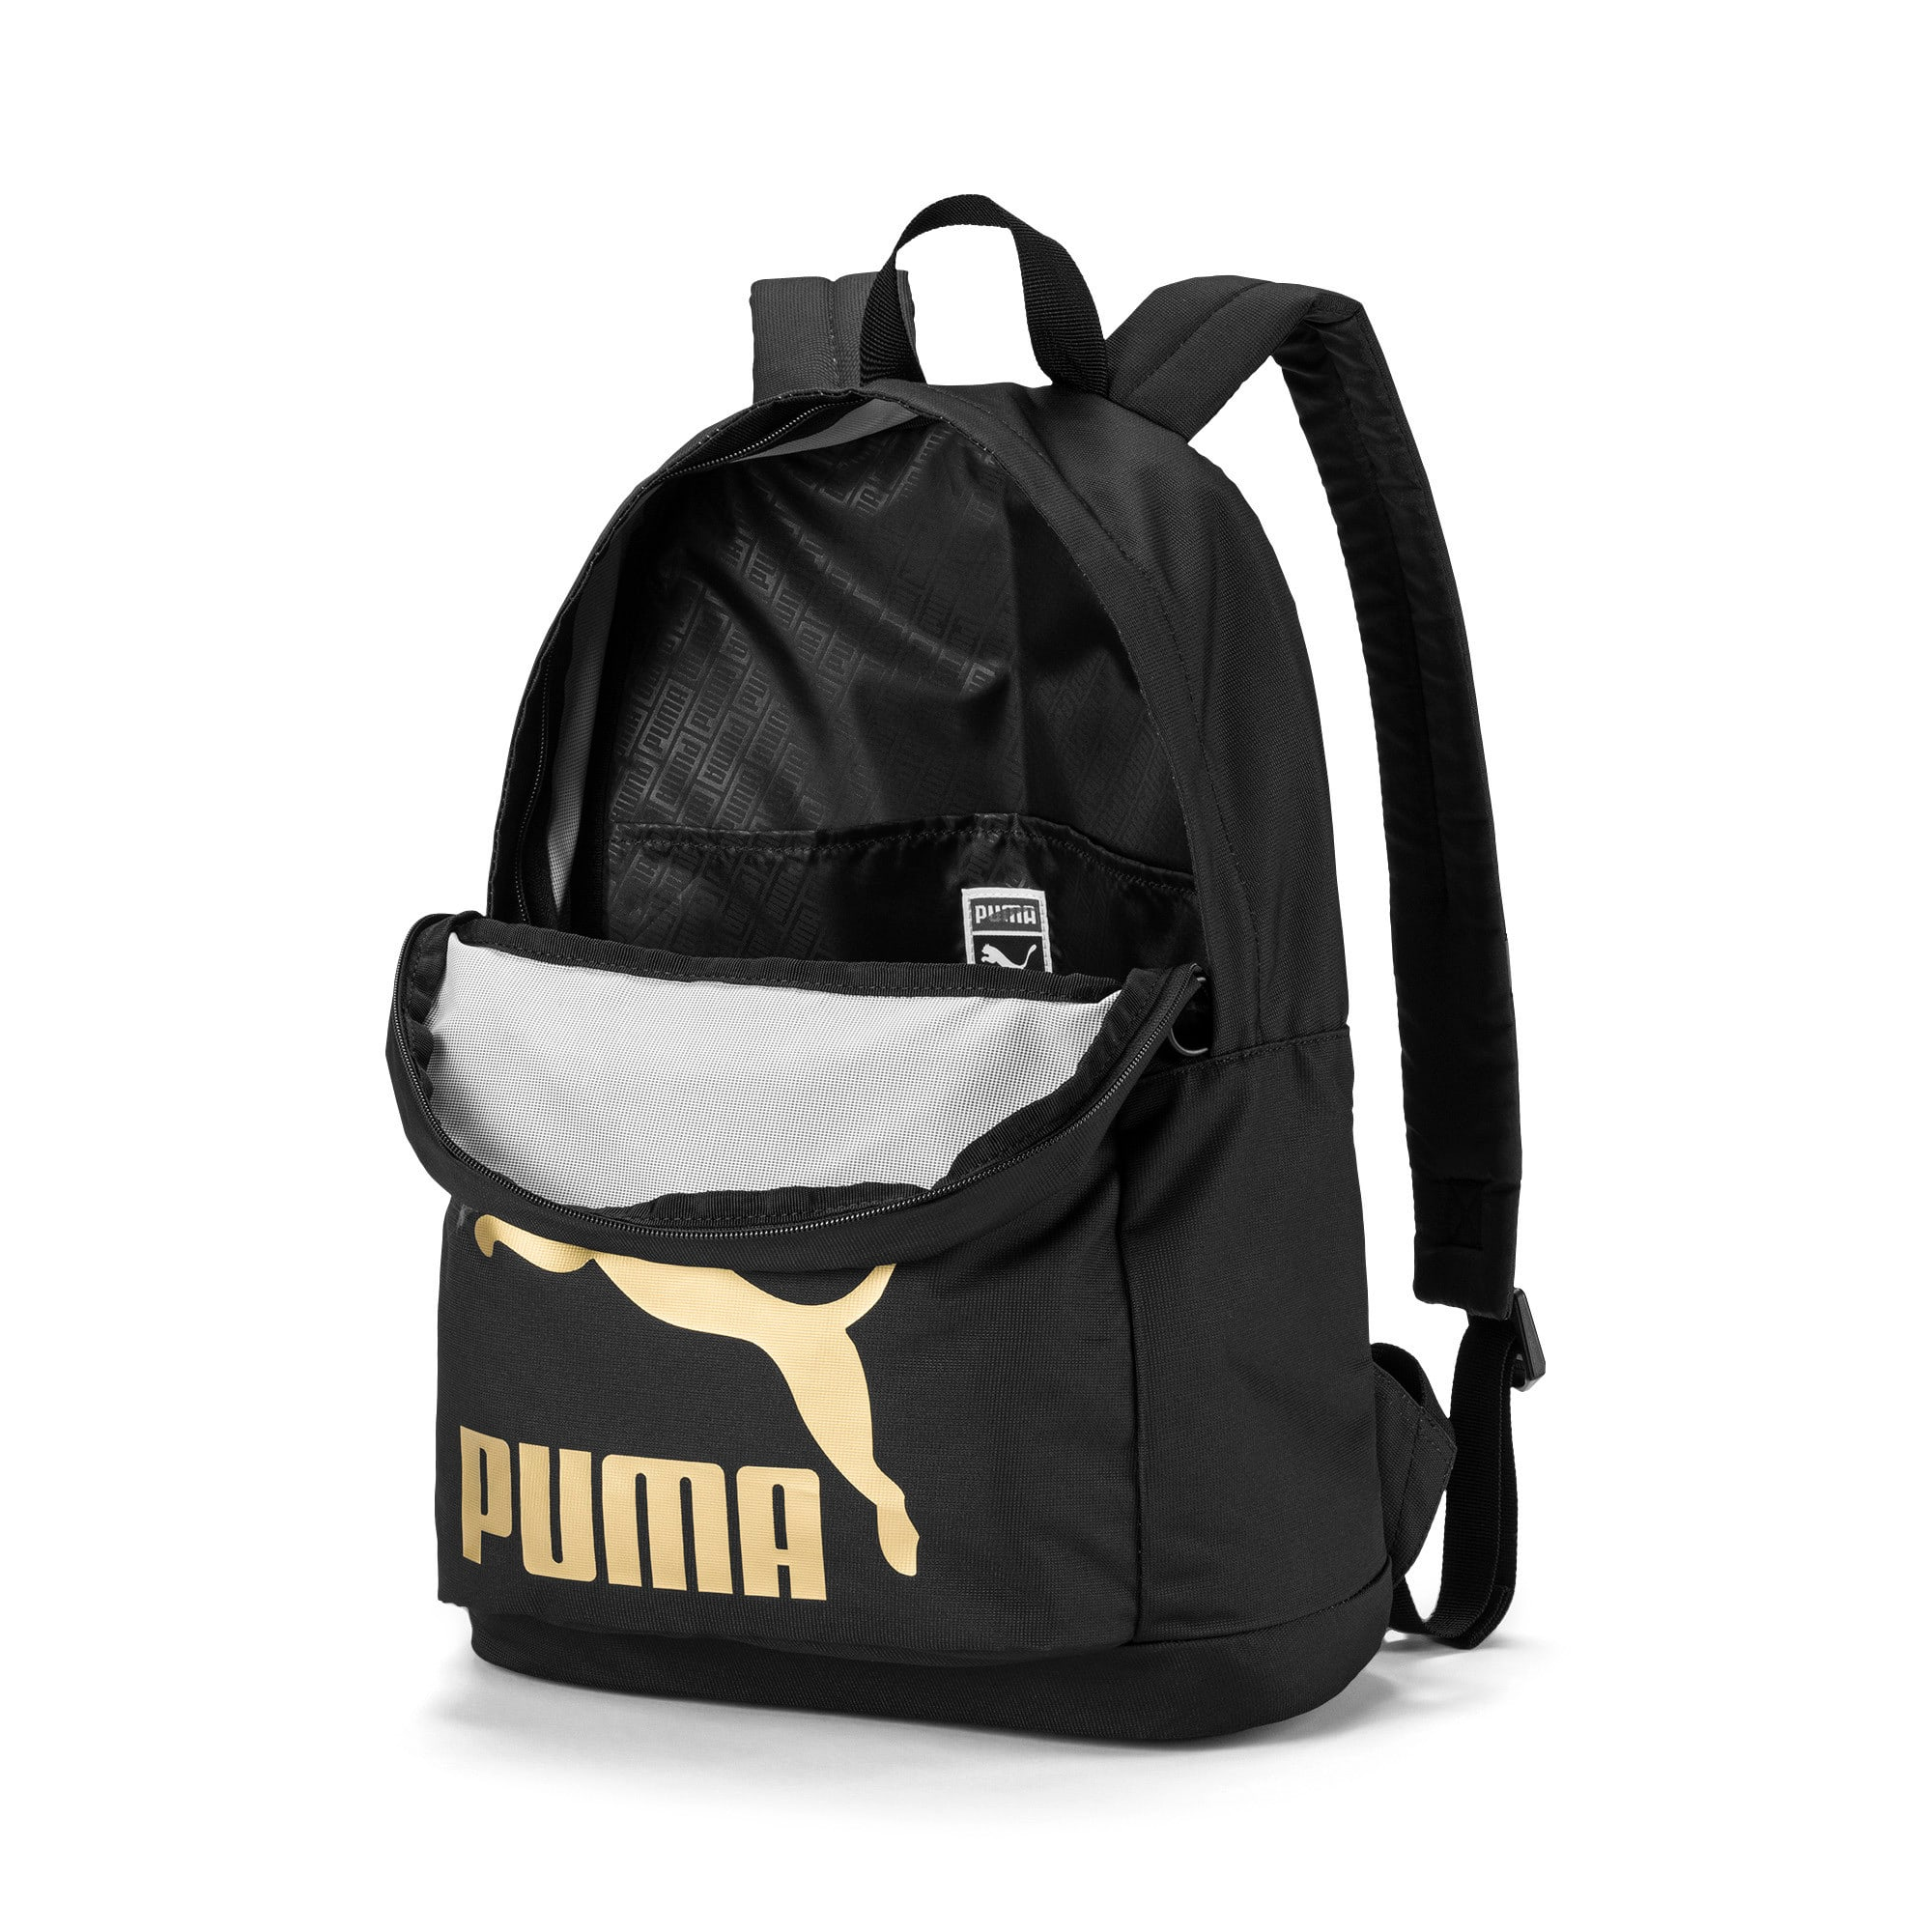 Thumbnail 6 of オリジナルス バックパック 20L, Puma Black, medium-JPN